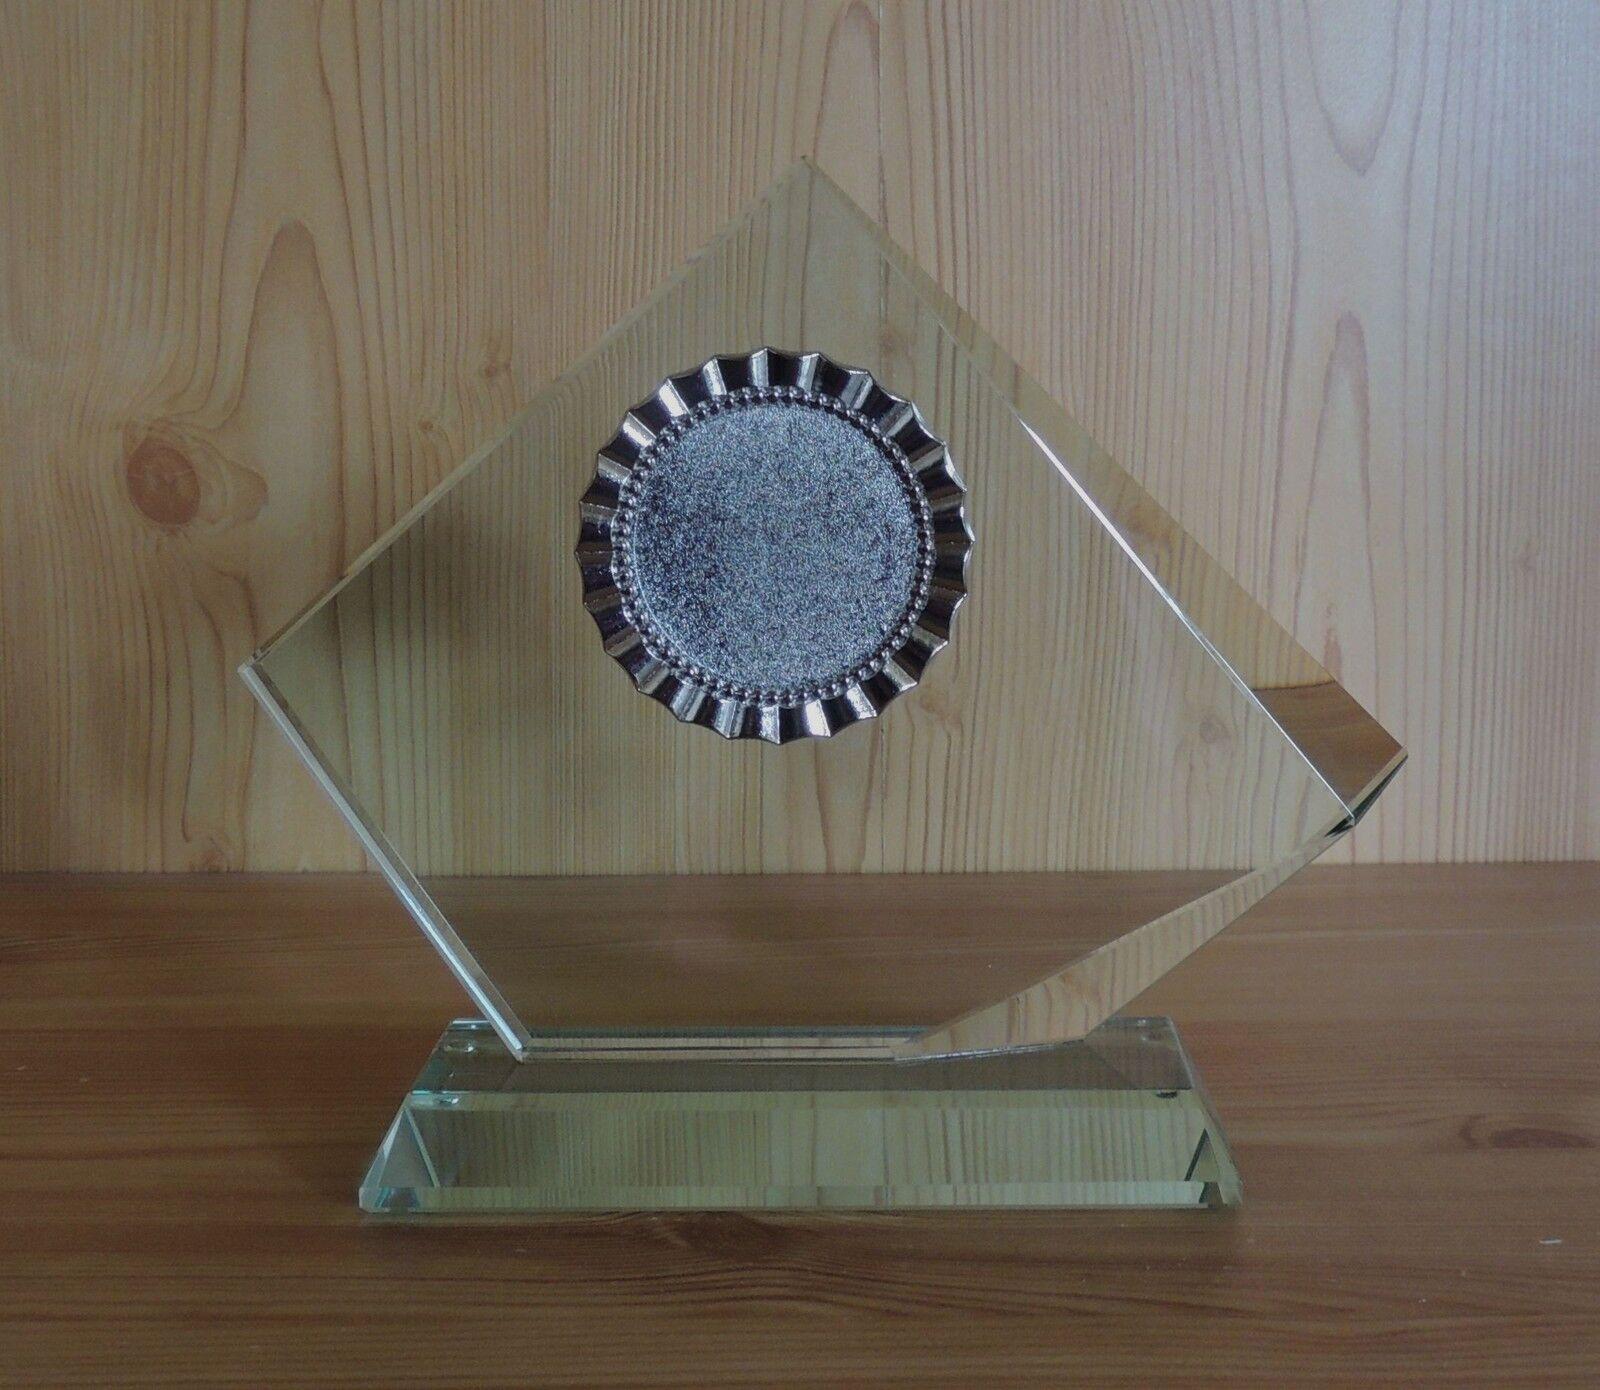 1 Jade Glas-Trophäe 15mm Größe 18x21cm mit Gravur (Glaspokale Pokal Pokal Pokal Jubiläum) c12e1c